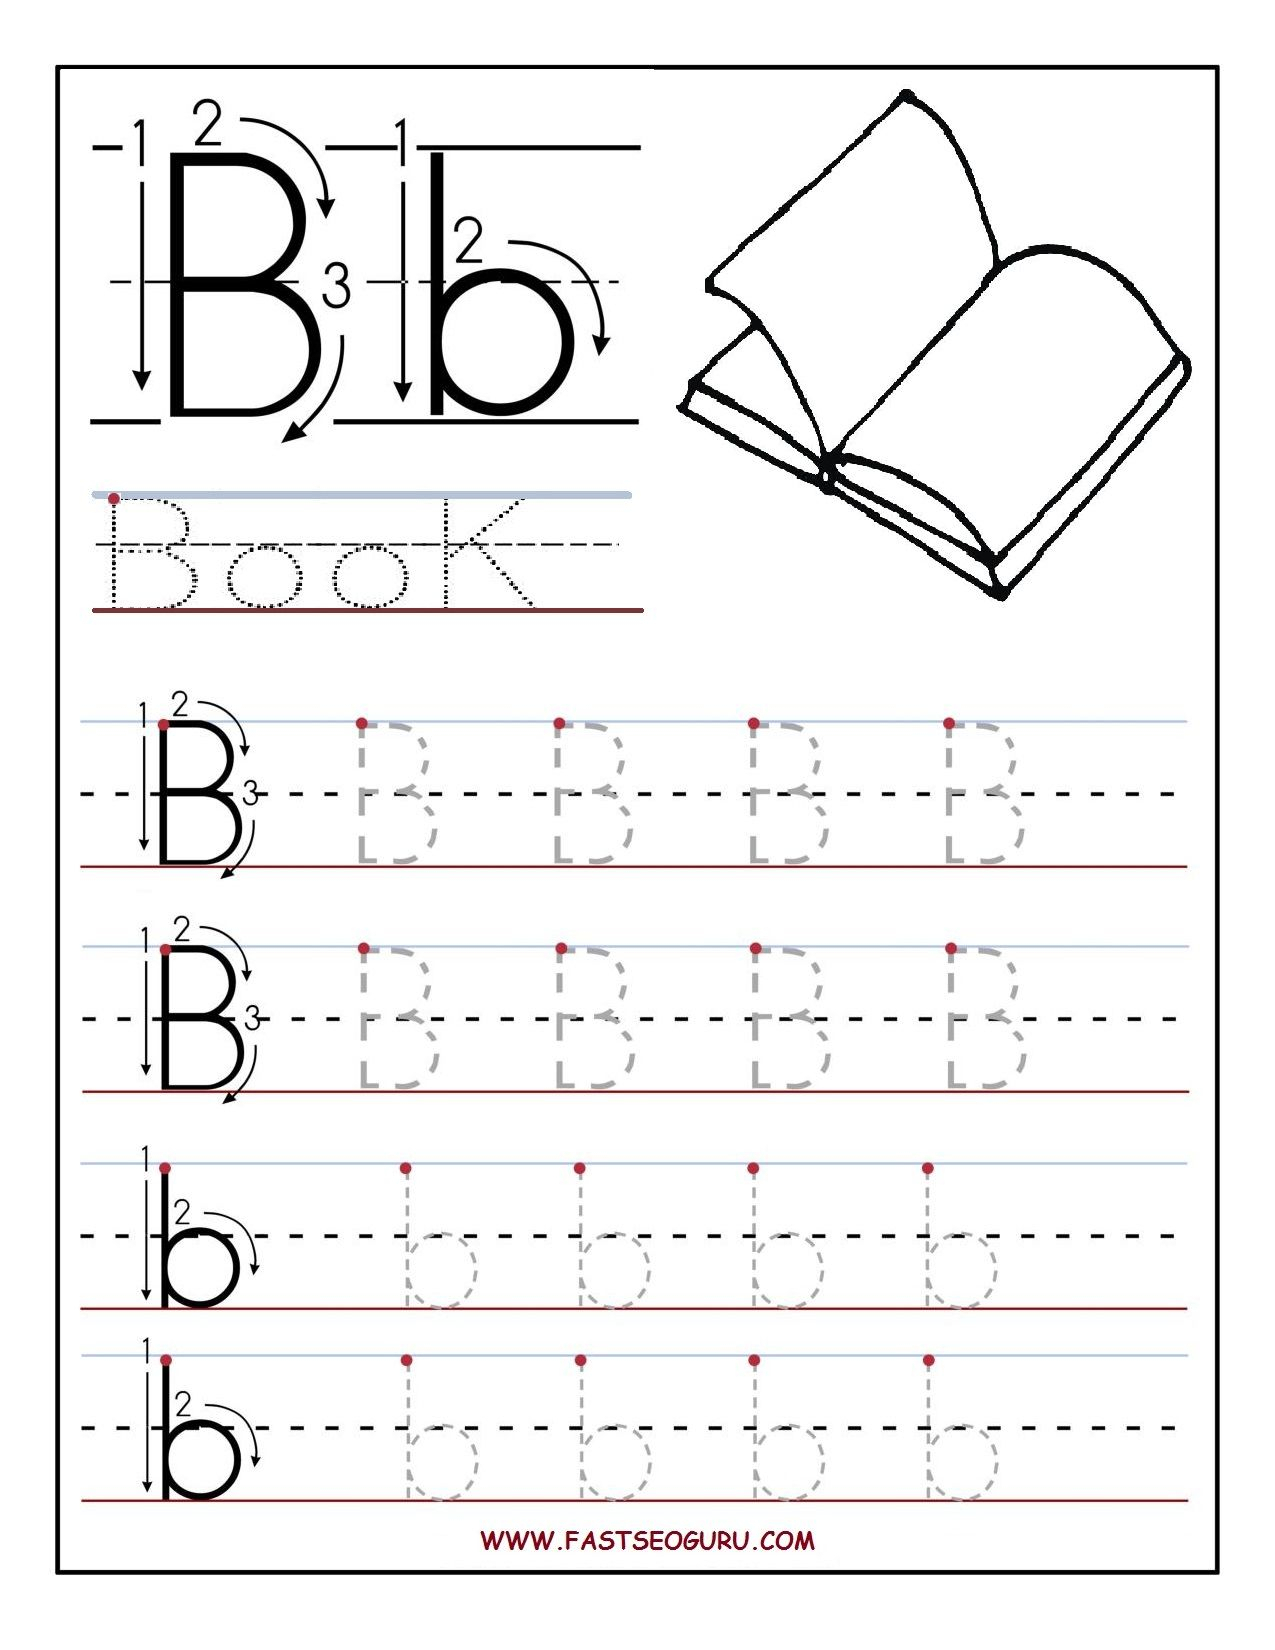 Printable Letter B Tracing Worksheets For Preschool with regard to Letter B Worksheets For First Grade